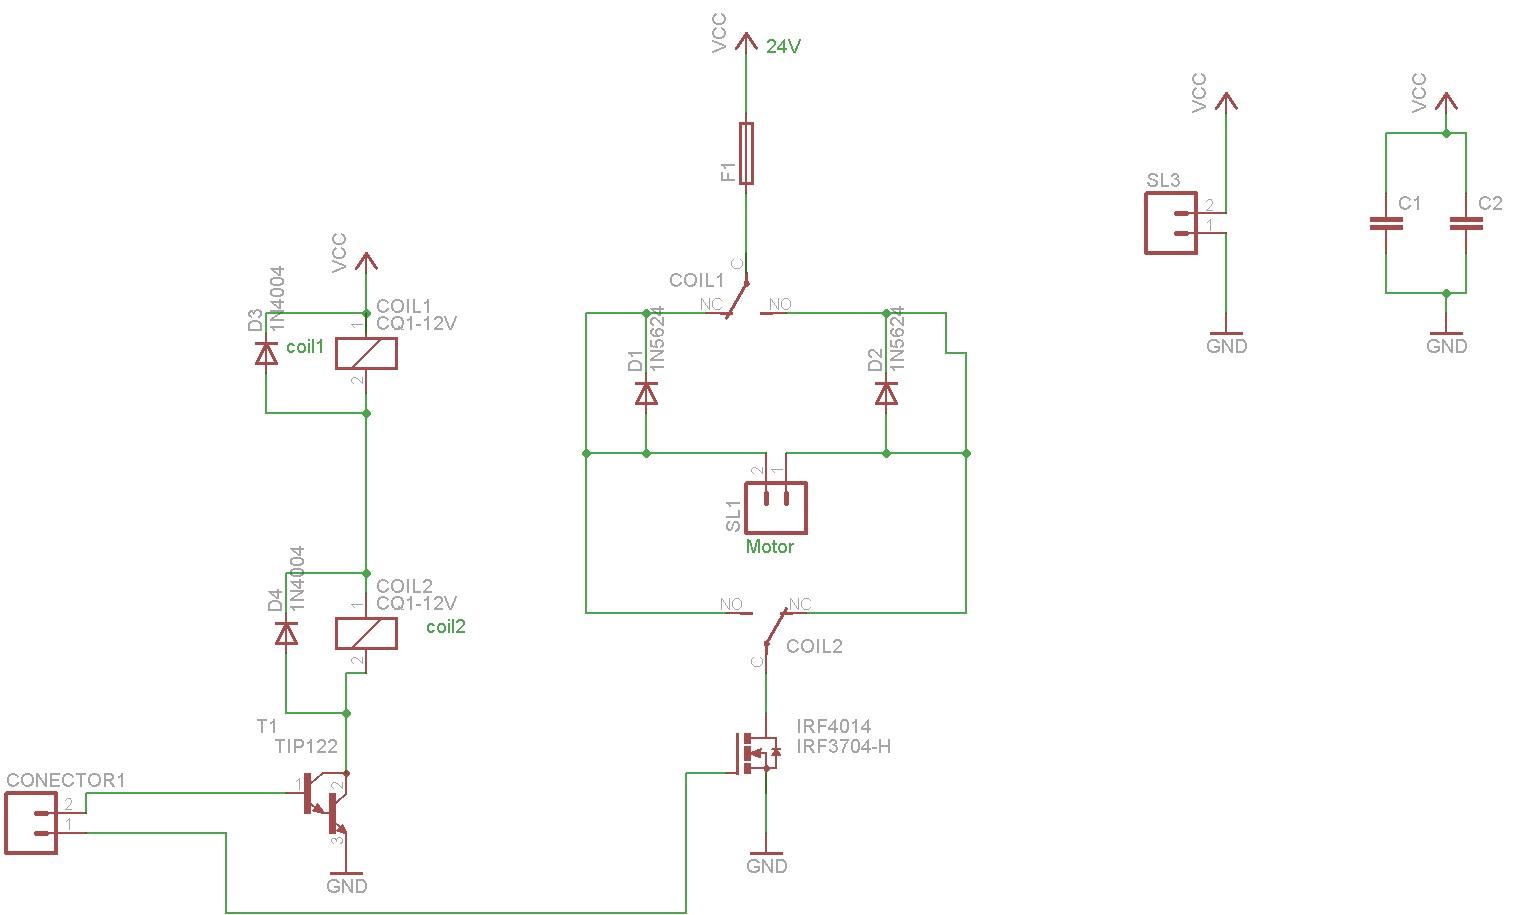 Subuk Raftar Segway From Nust Pnec November 2011 Wiring Diagram